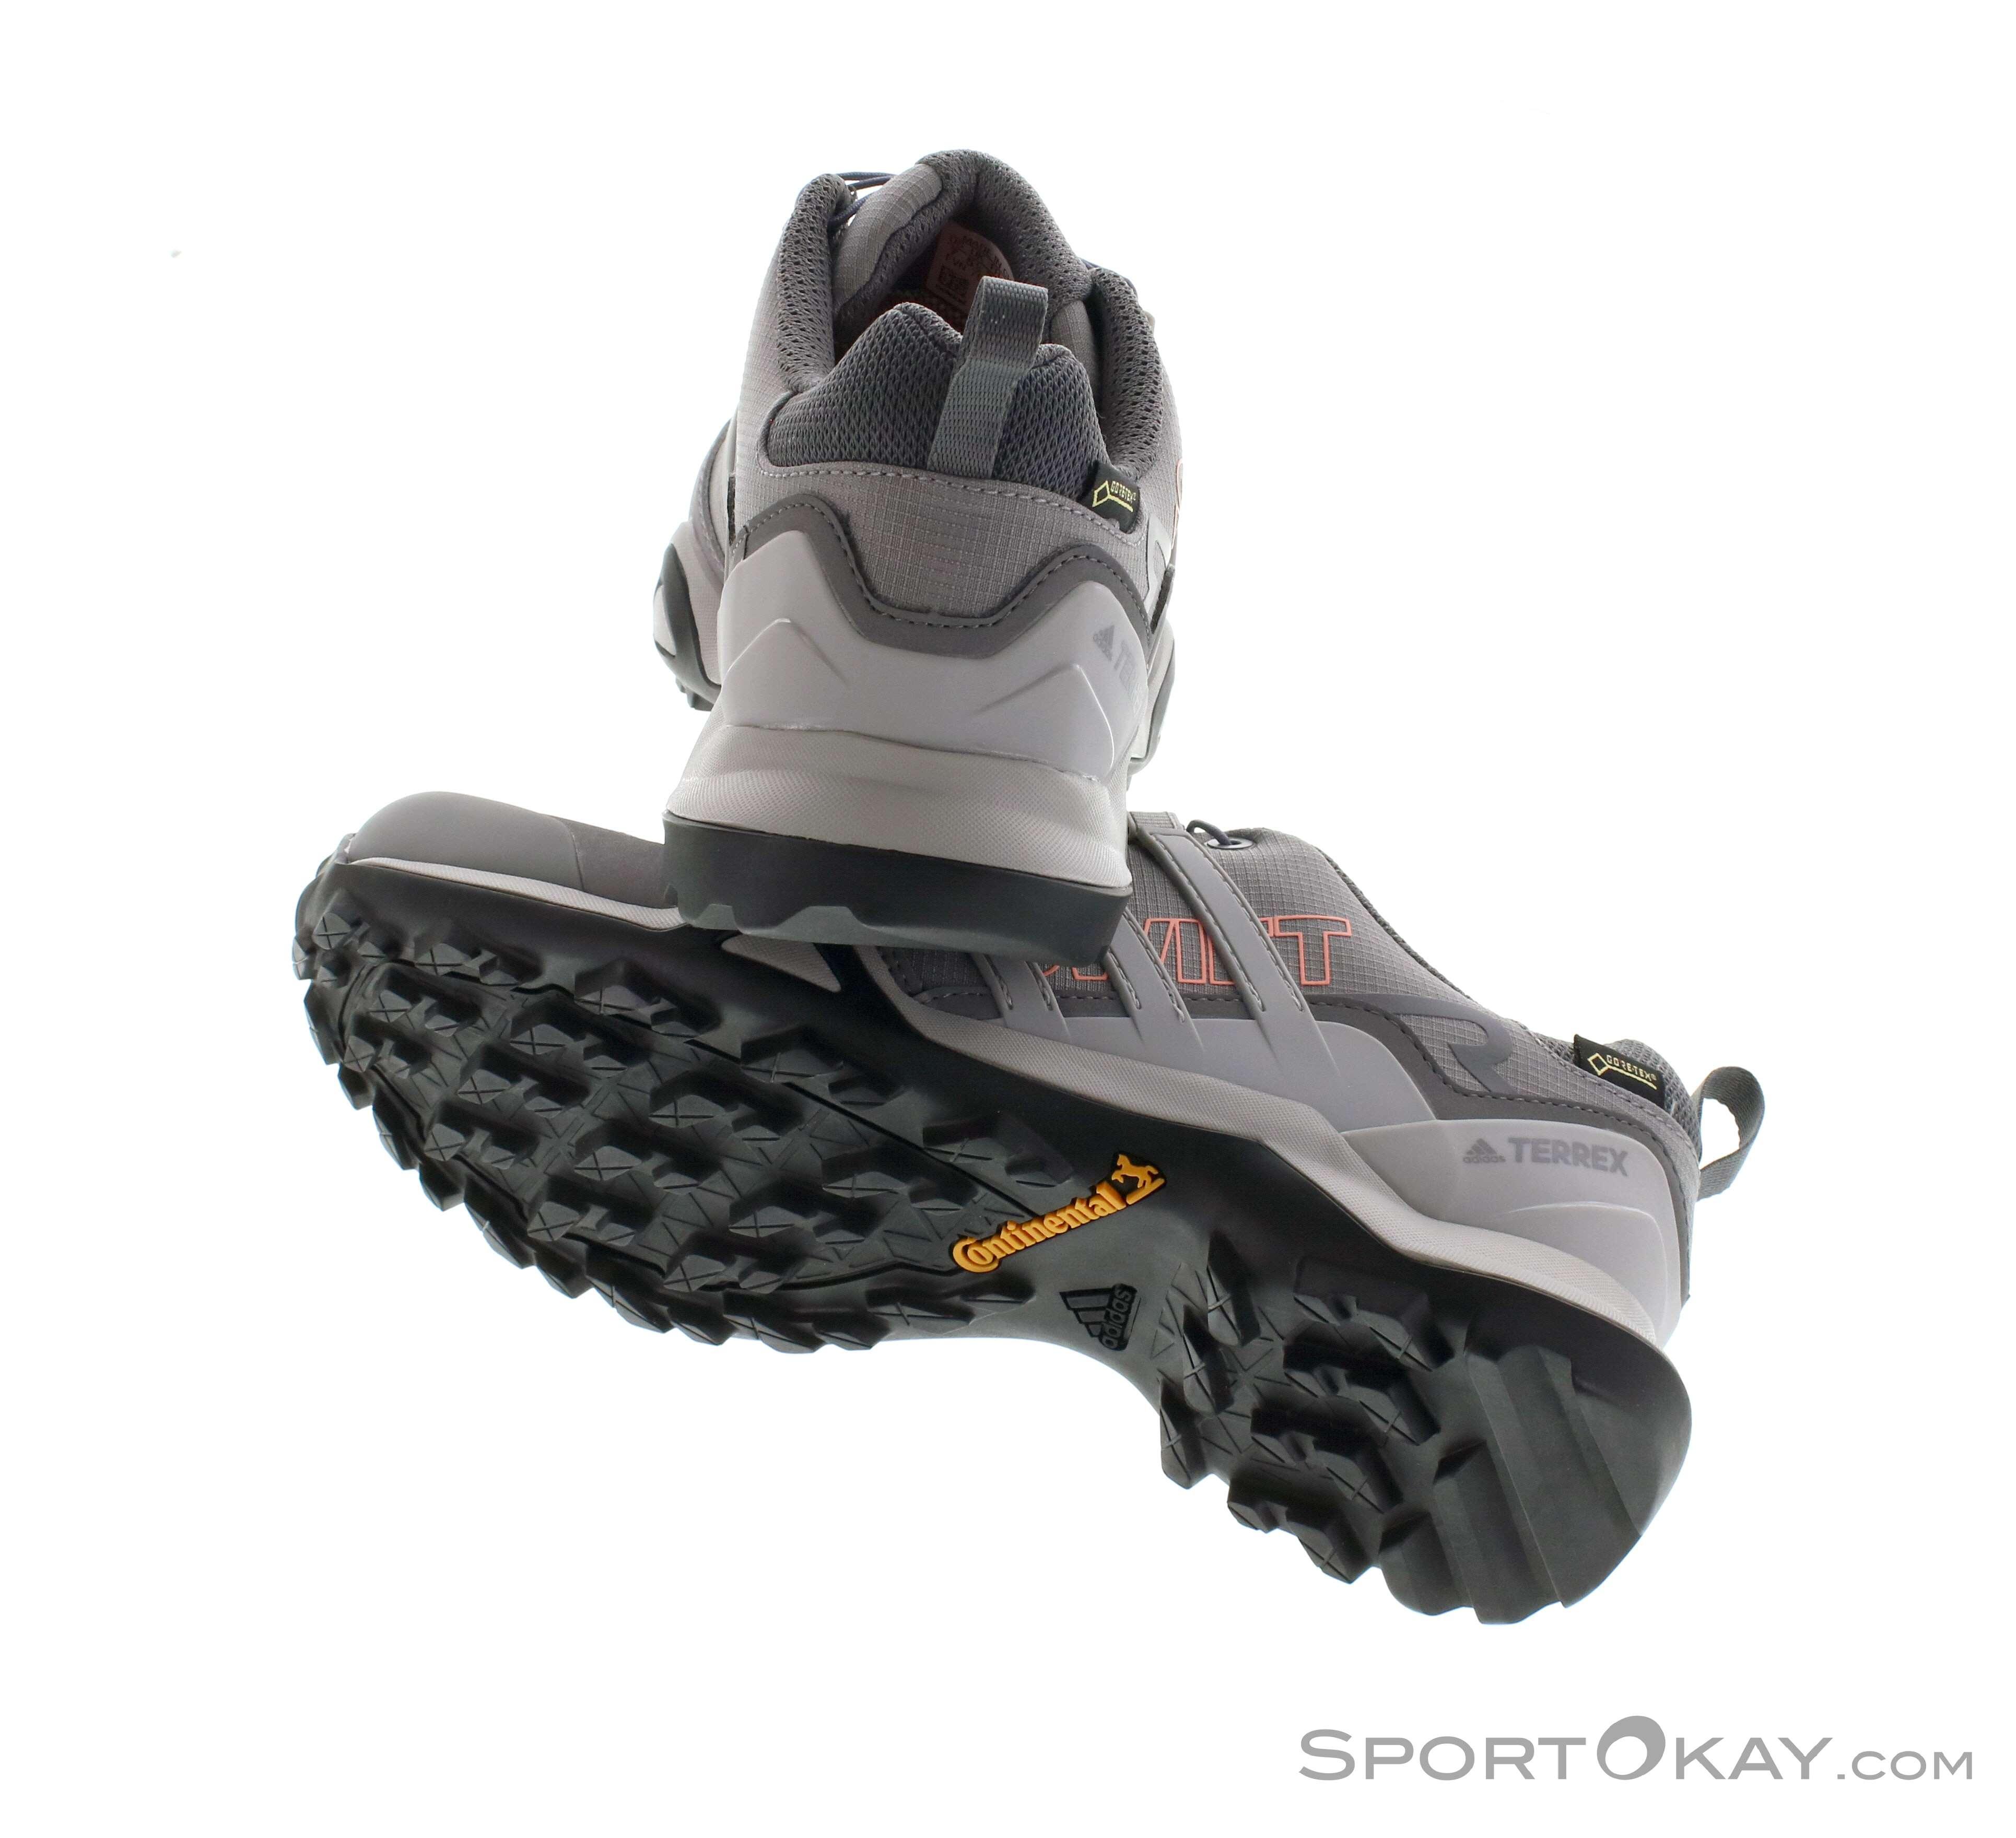 98a5620026054 adidas Terrex Swift R2 GTX Womens Trekking Shoes Gore-Tex - Gore-Tex ...